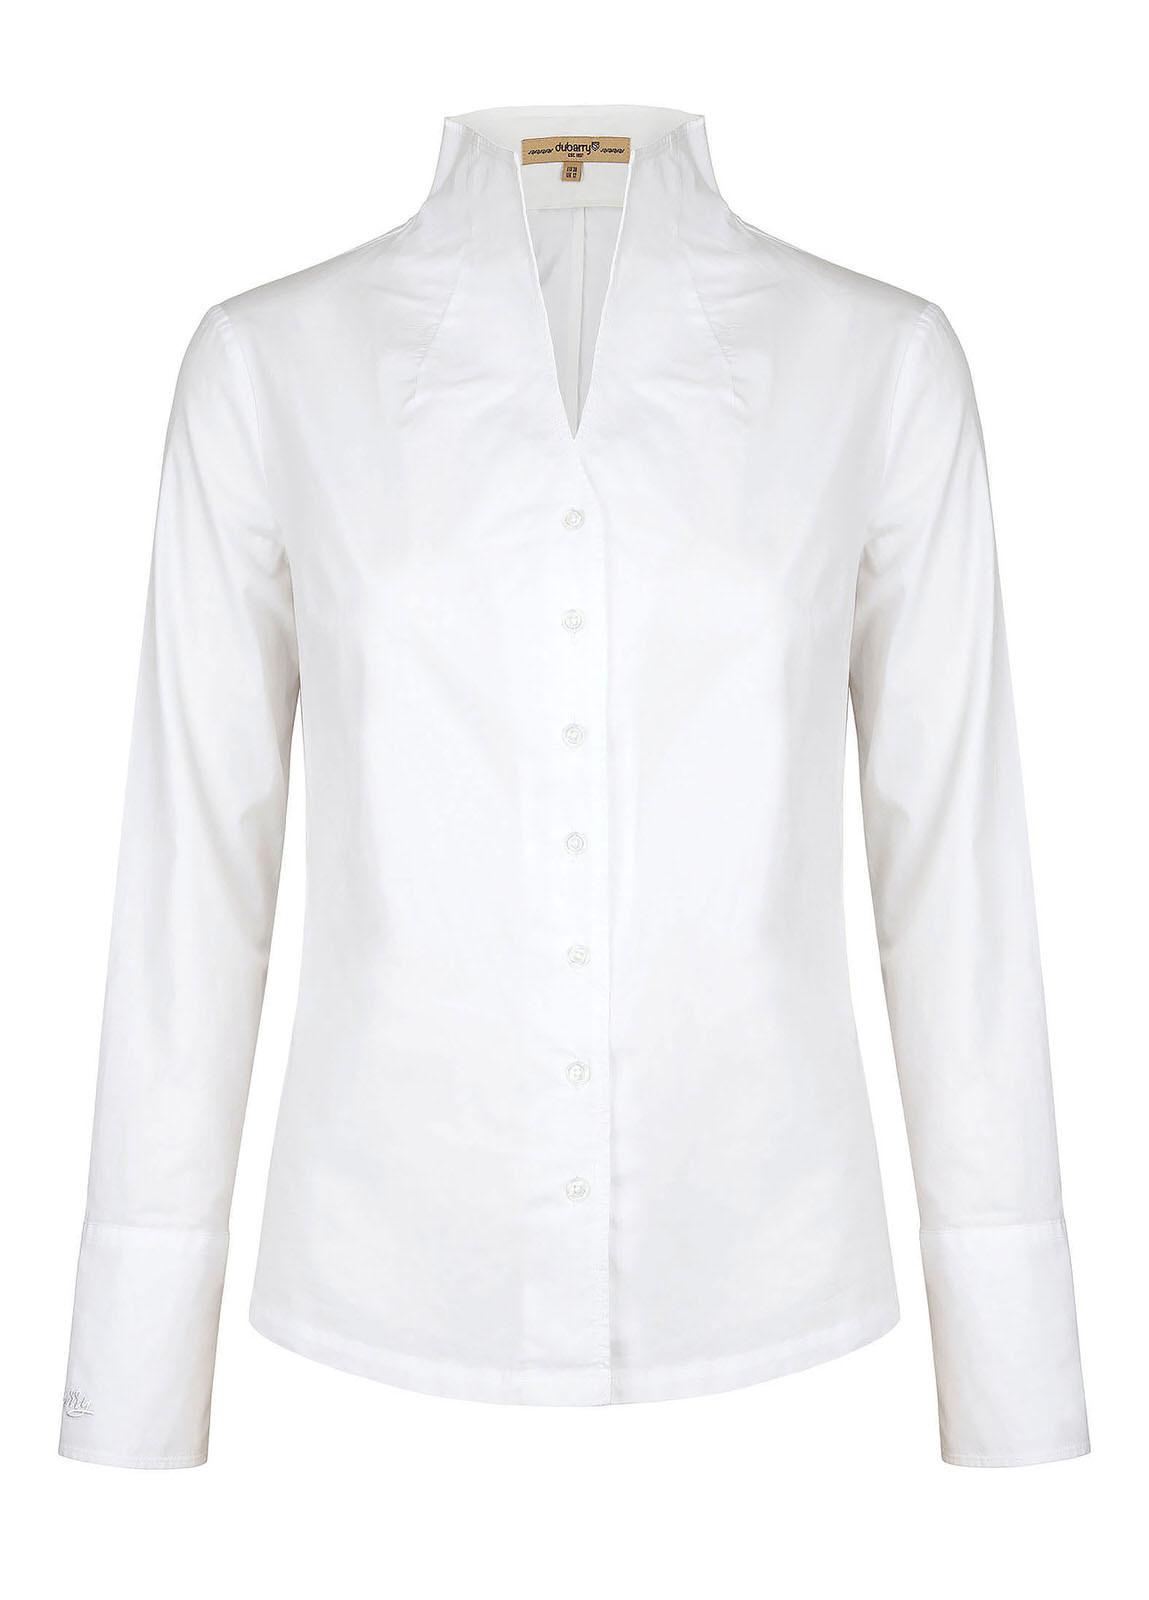 Snowdrop_Shirt_White_Image_1